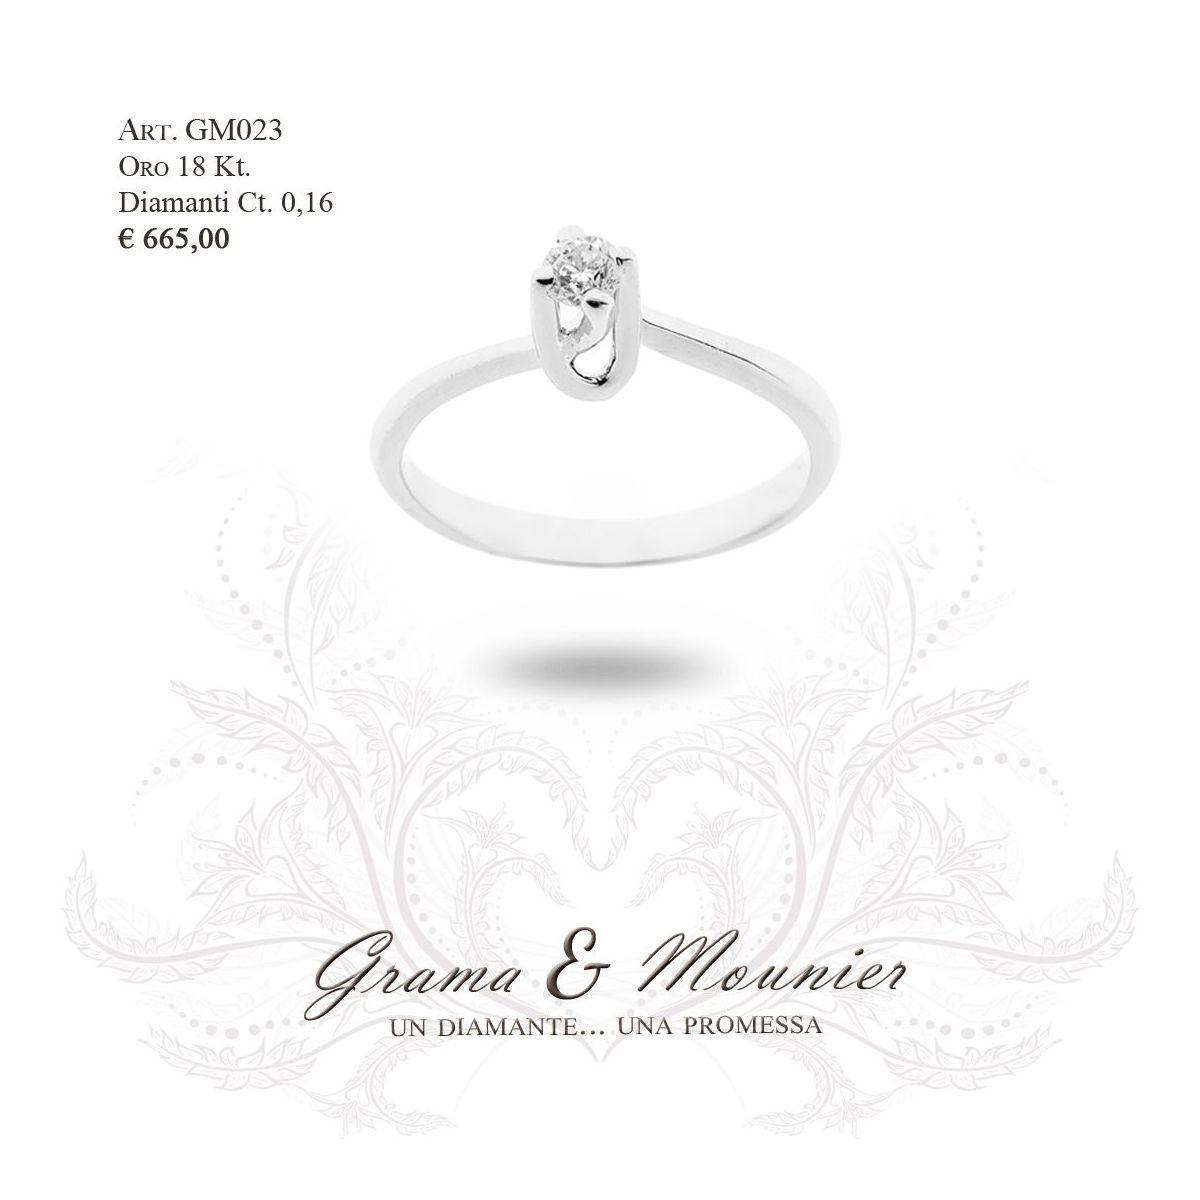 Anello in oro 18Kt. Grama&Mounier Art.GM023